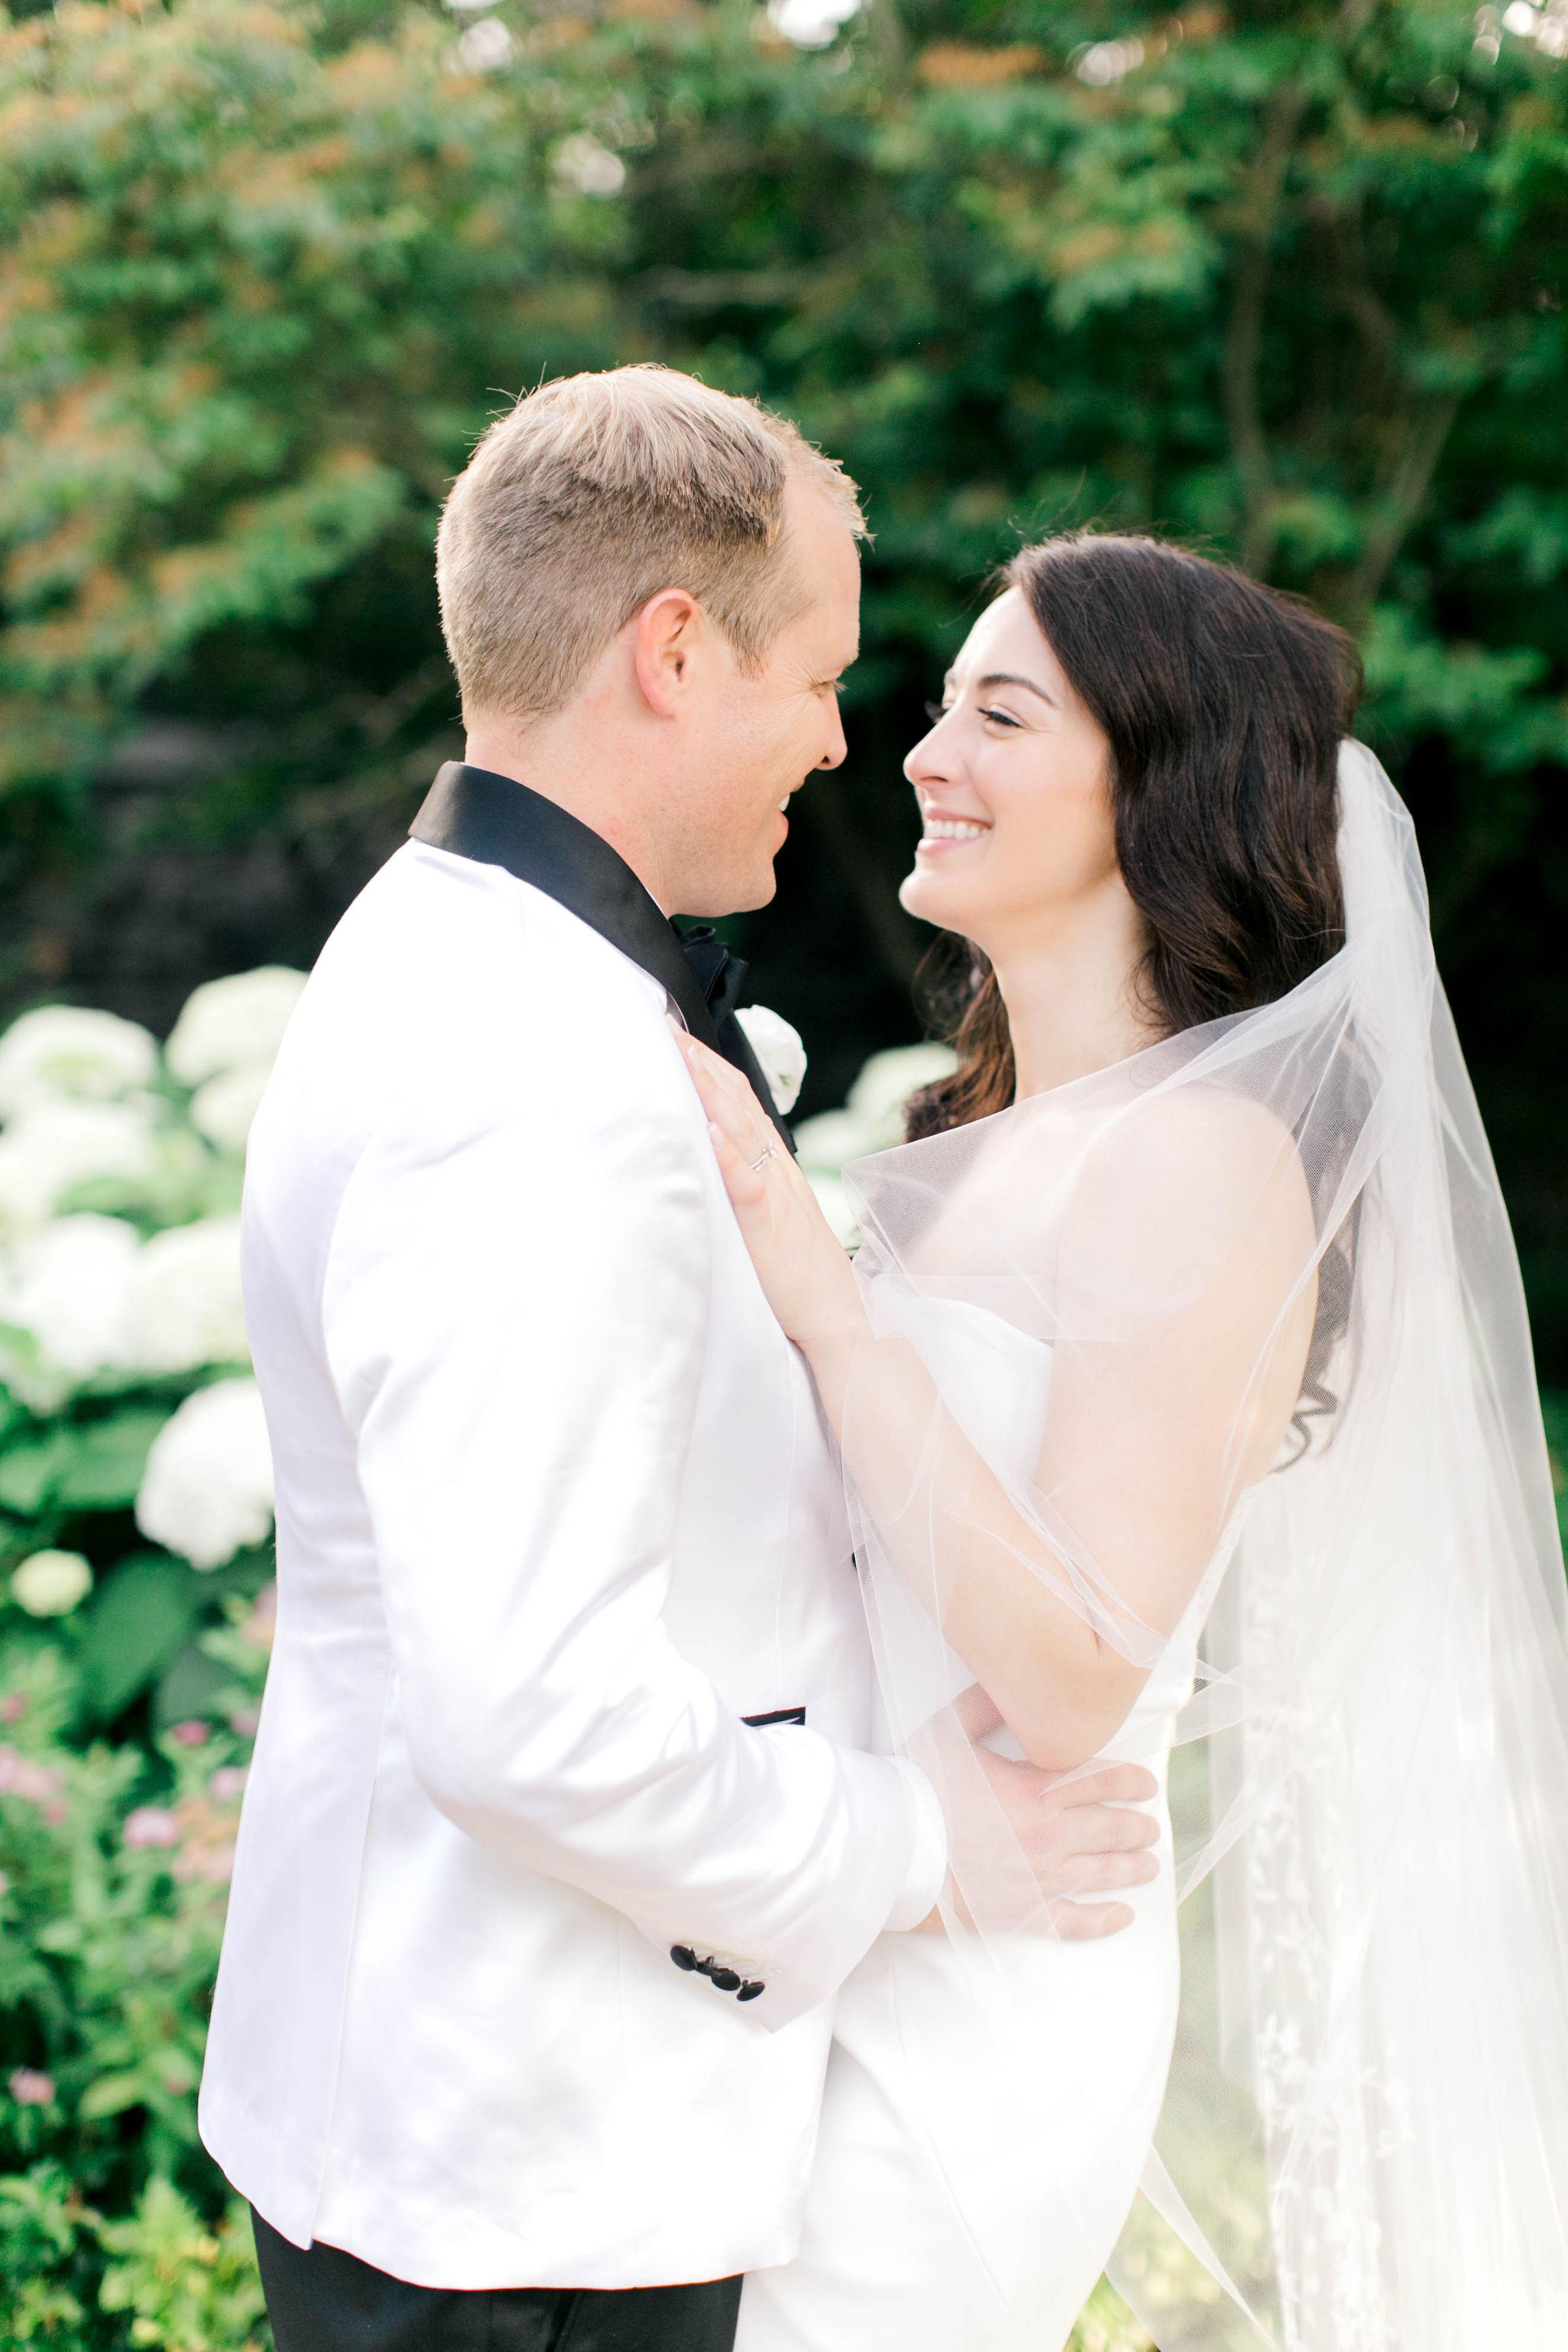 langdon-hall-wedding-photographer-soft-airy-kurtz-brooke-jon-565.jpg